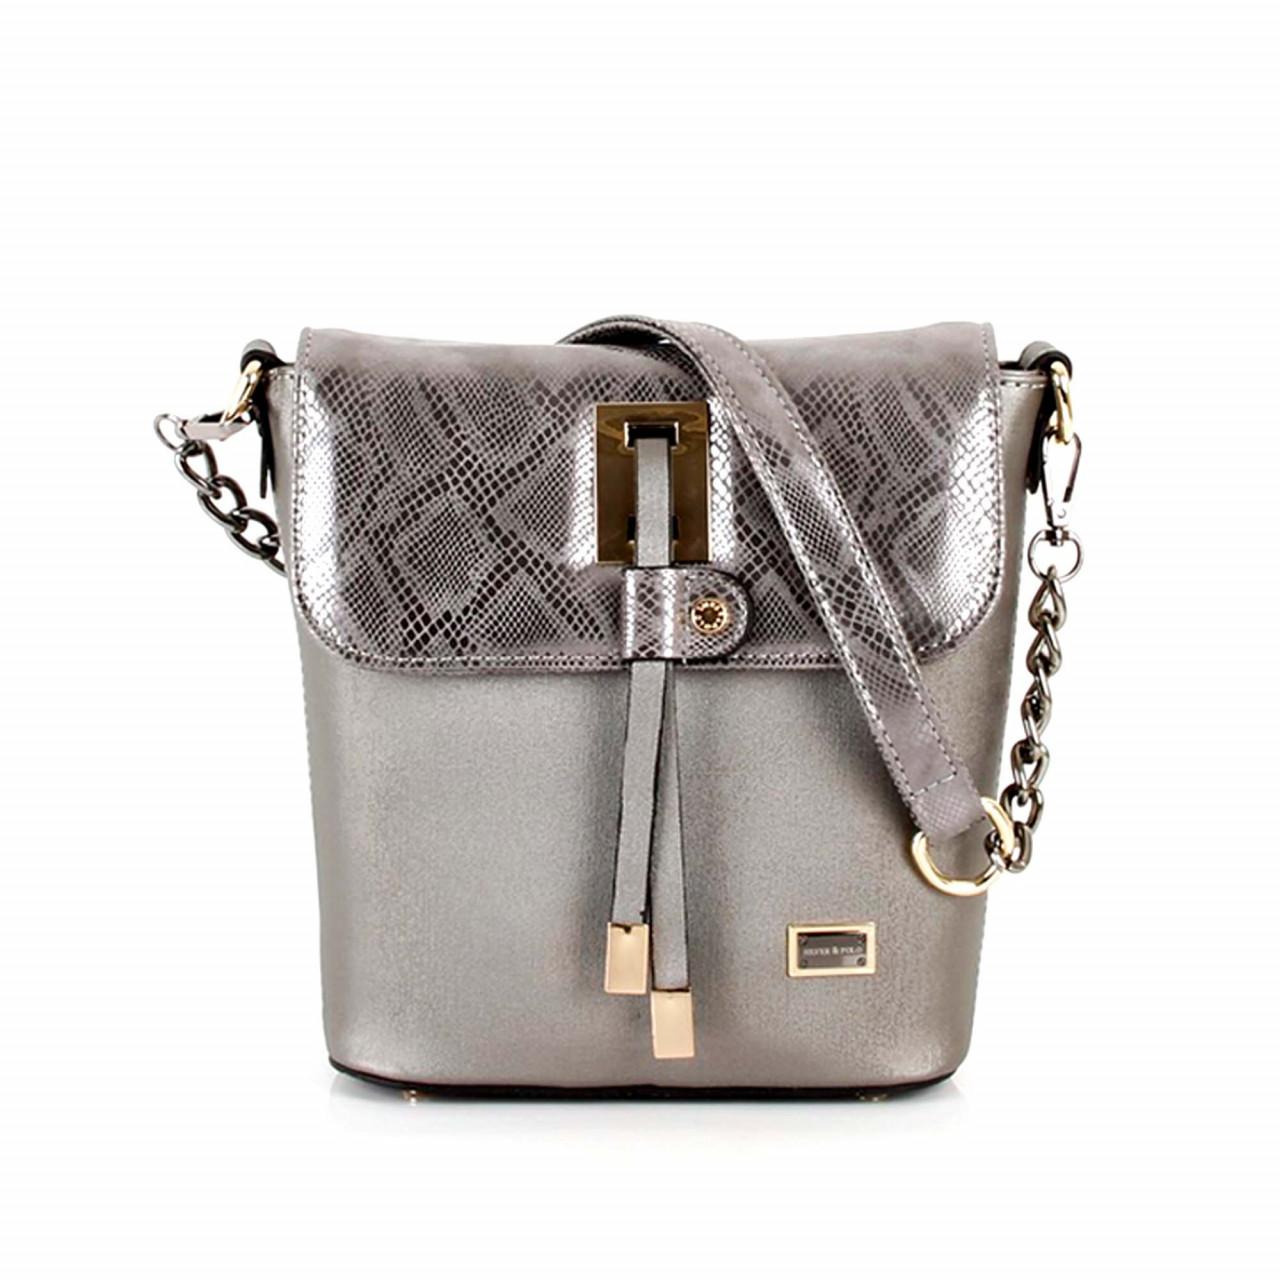 Модерна дамска чанта в сребристо сиво